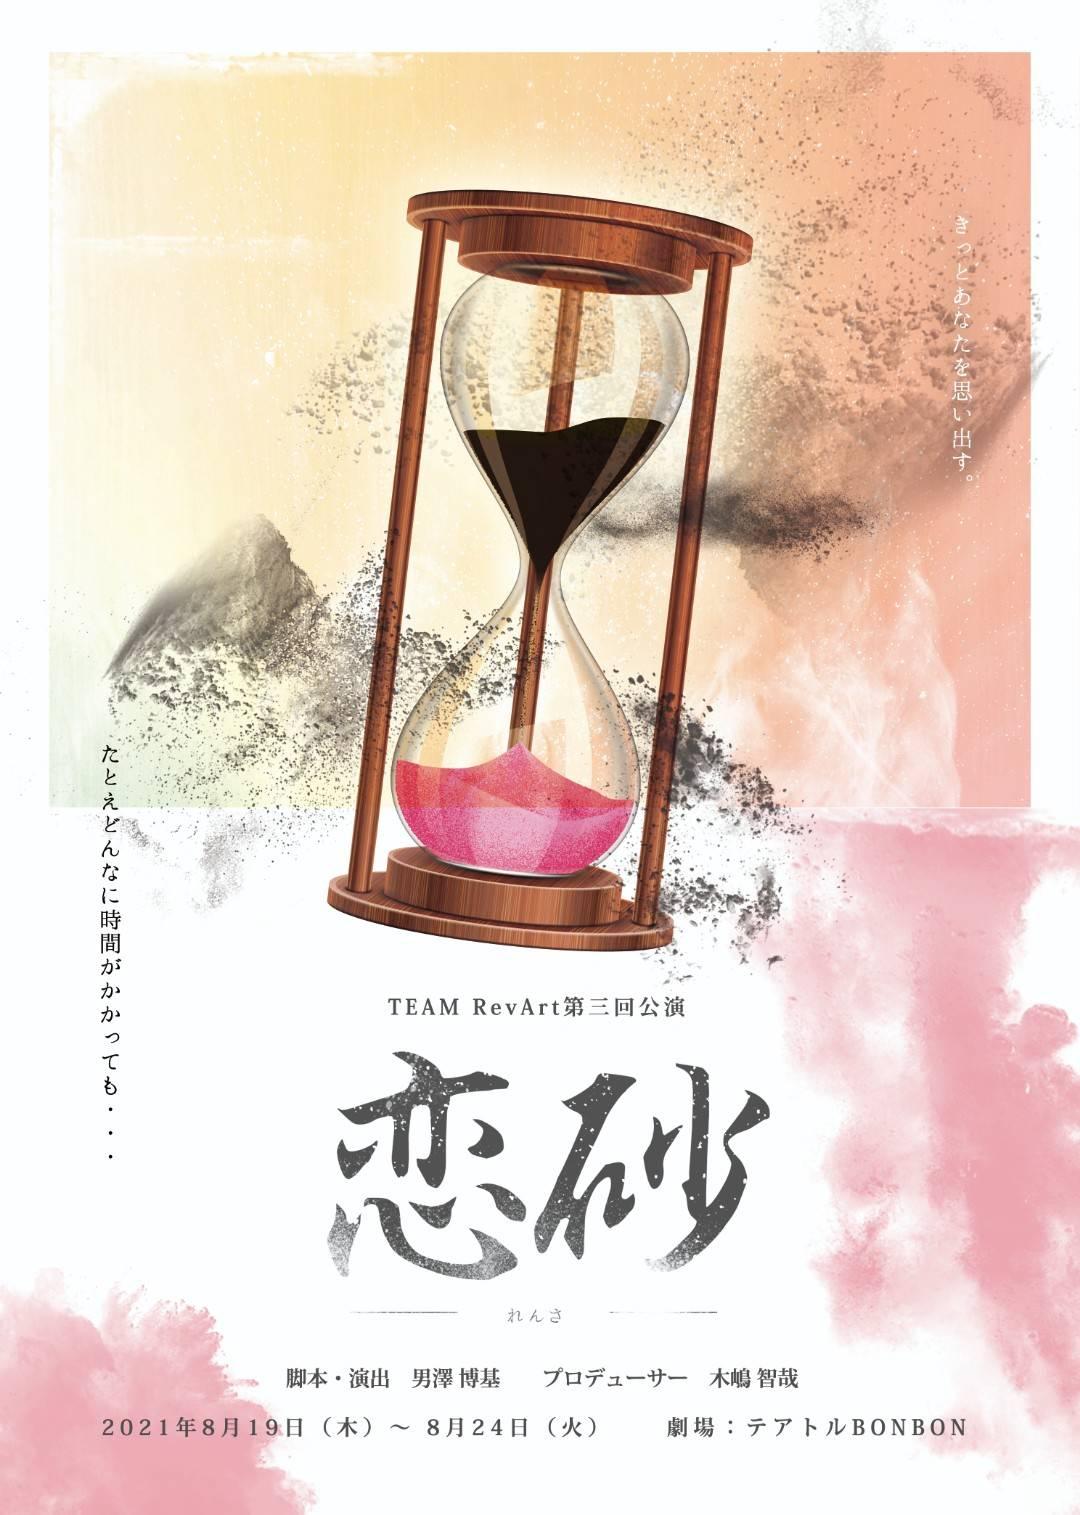 TEAM RevArt 第三回公演 恋砂 ーれんさー 「計」8/24 16:00~